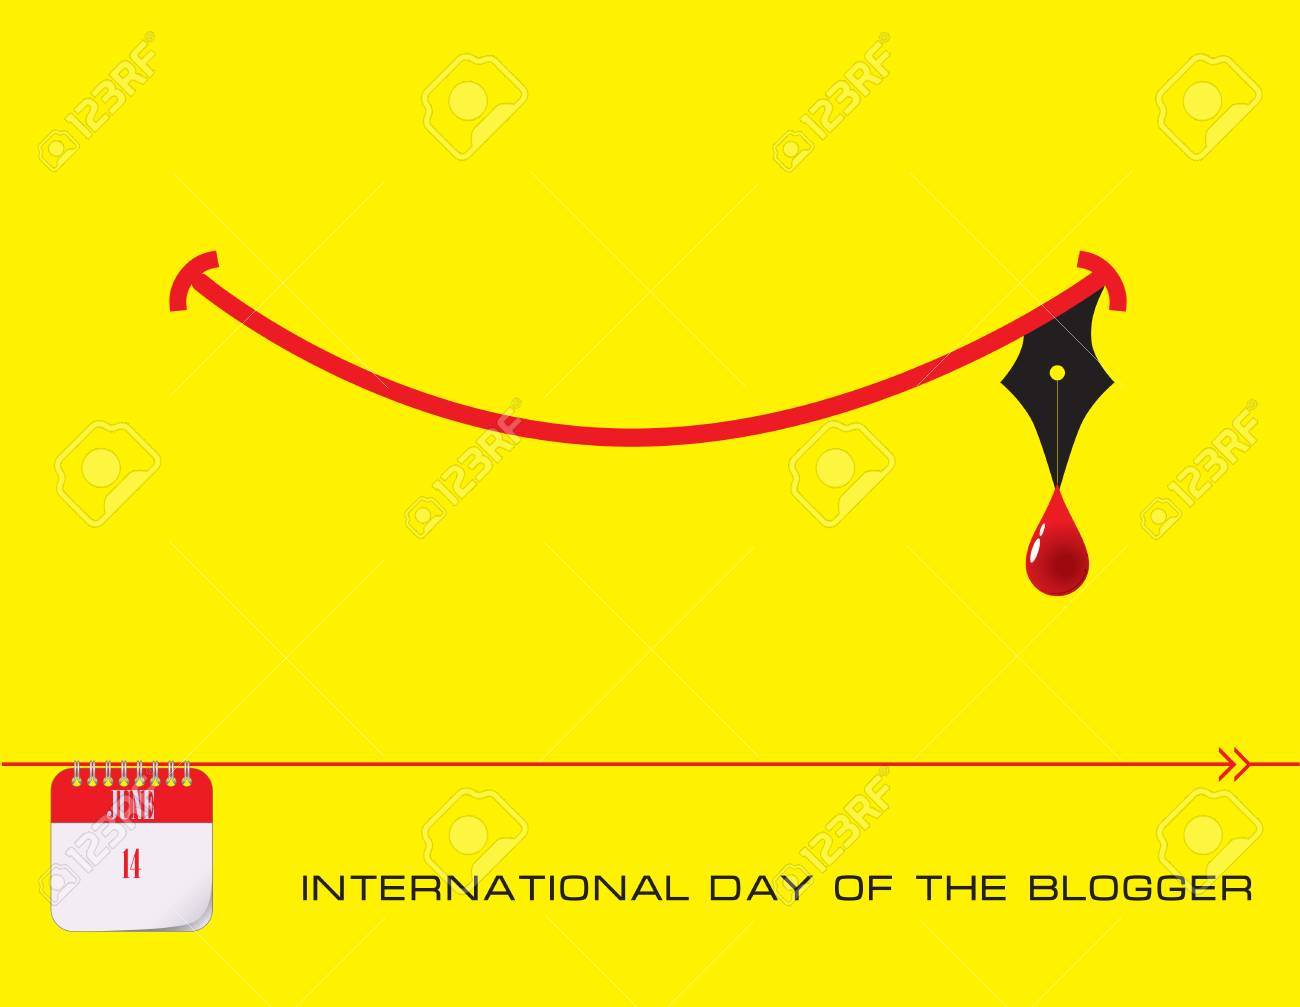 Calendar Events Of June Congratulations For International Day